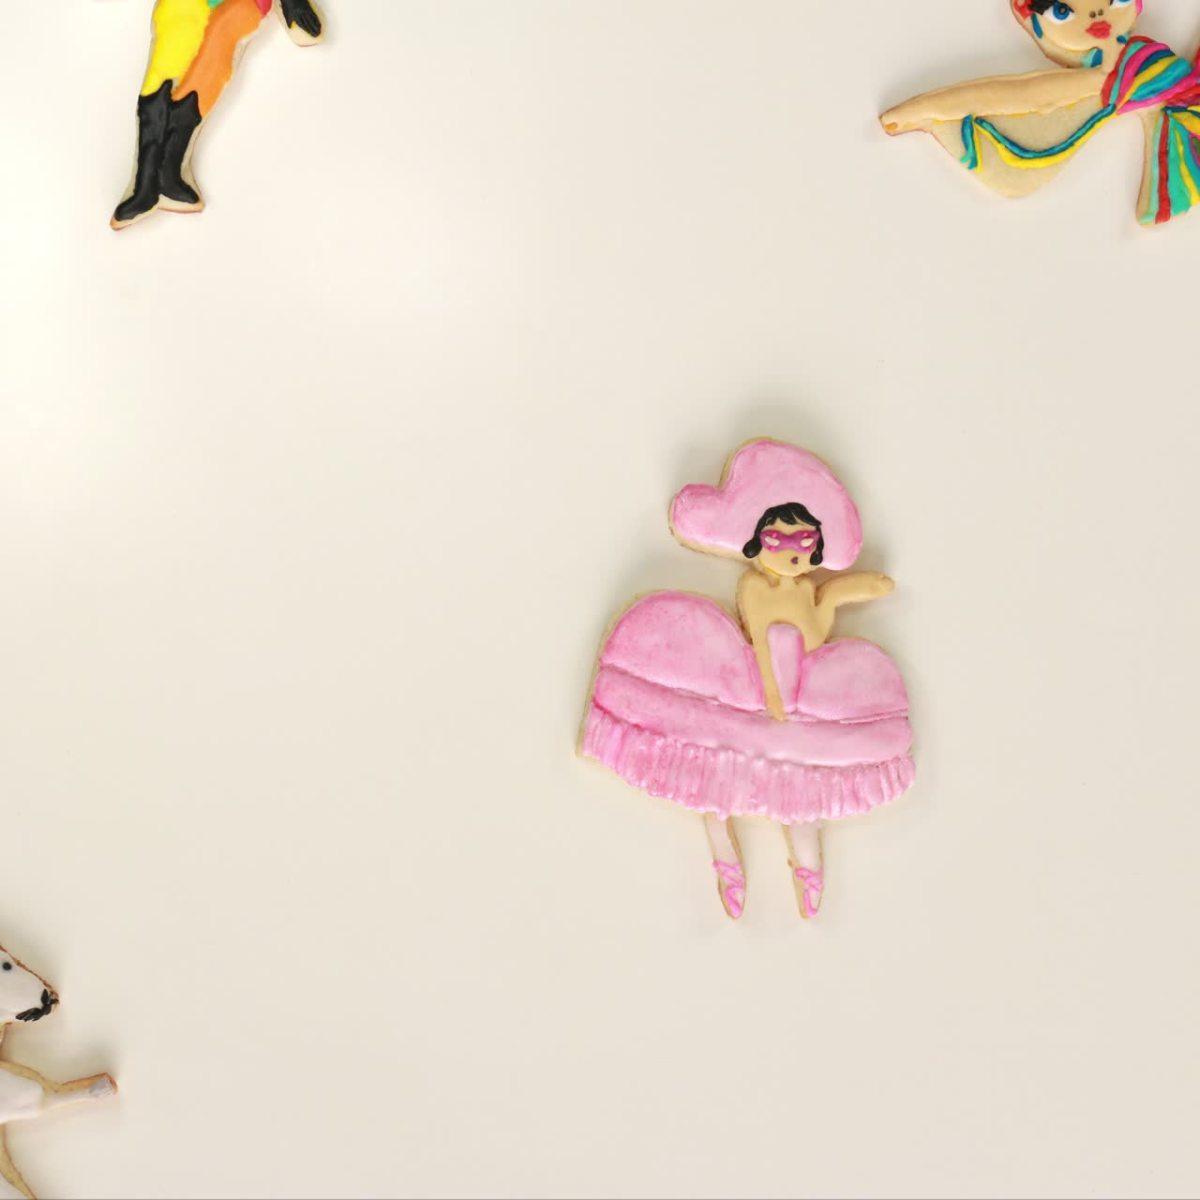 Diy Sugar Cookies Inspired By Miami City Ballet S All New Nutcracker